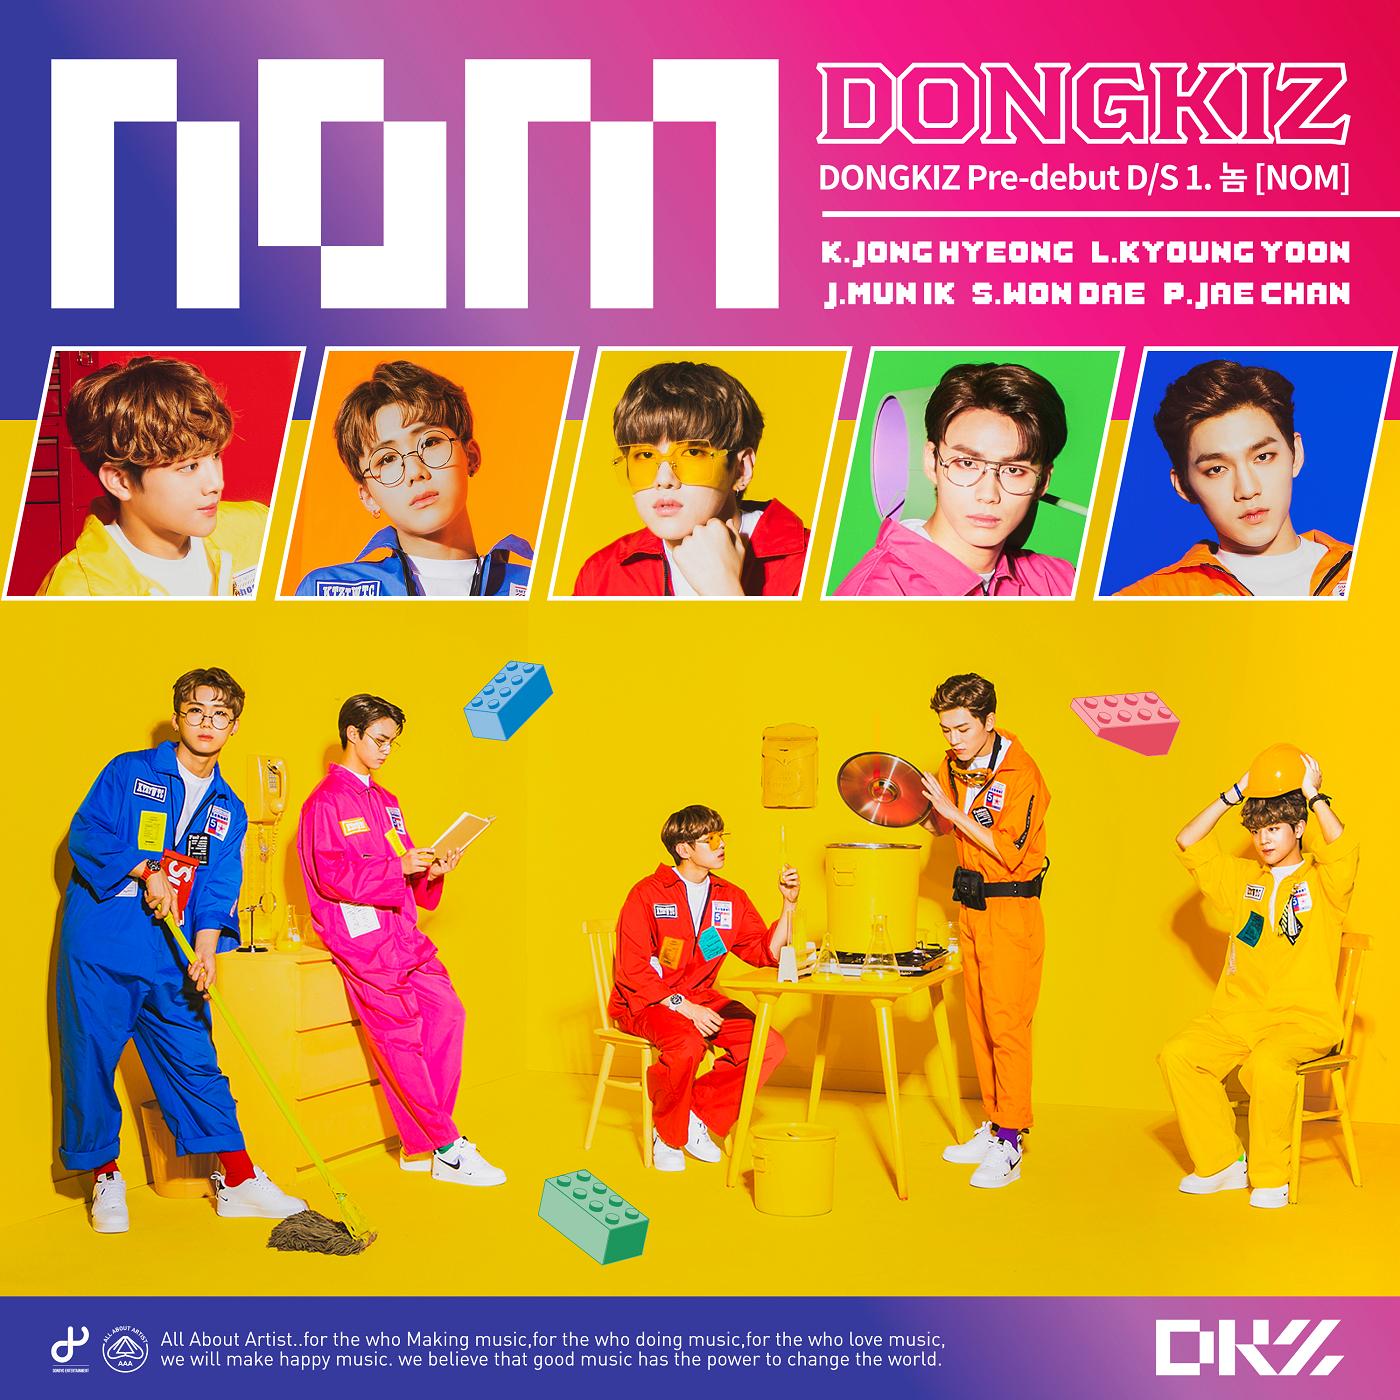 DONGKIZ Pre-debut D/S 1.